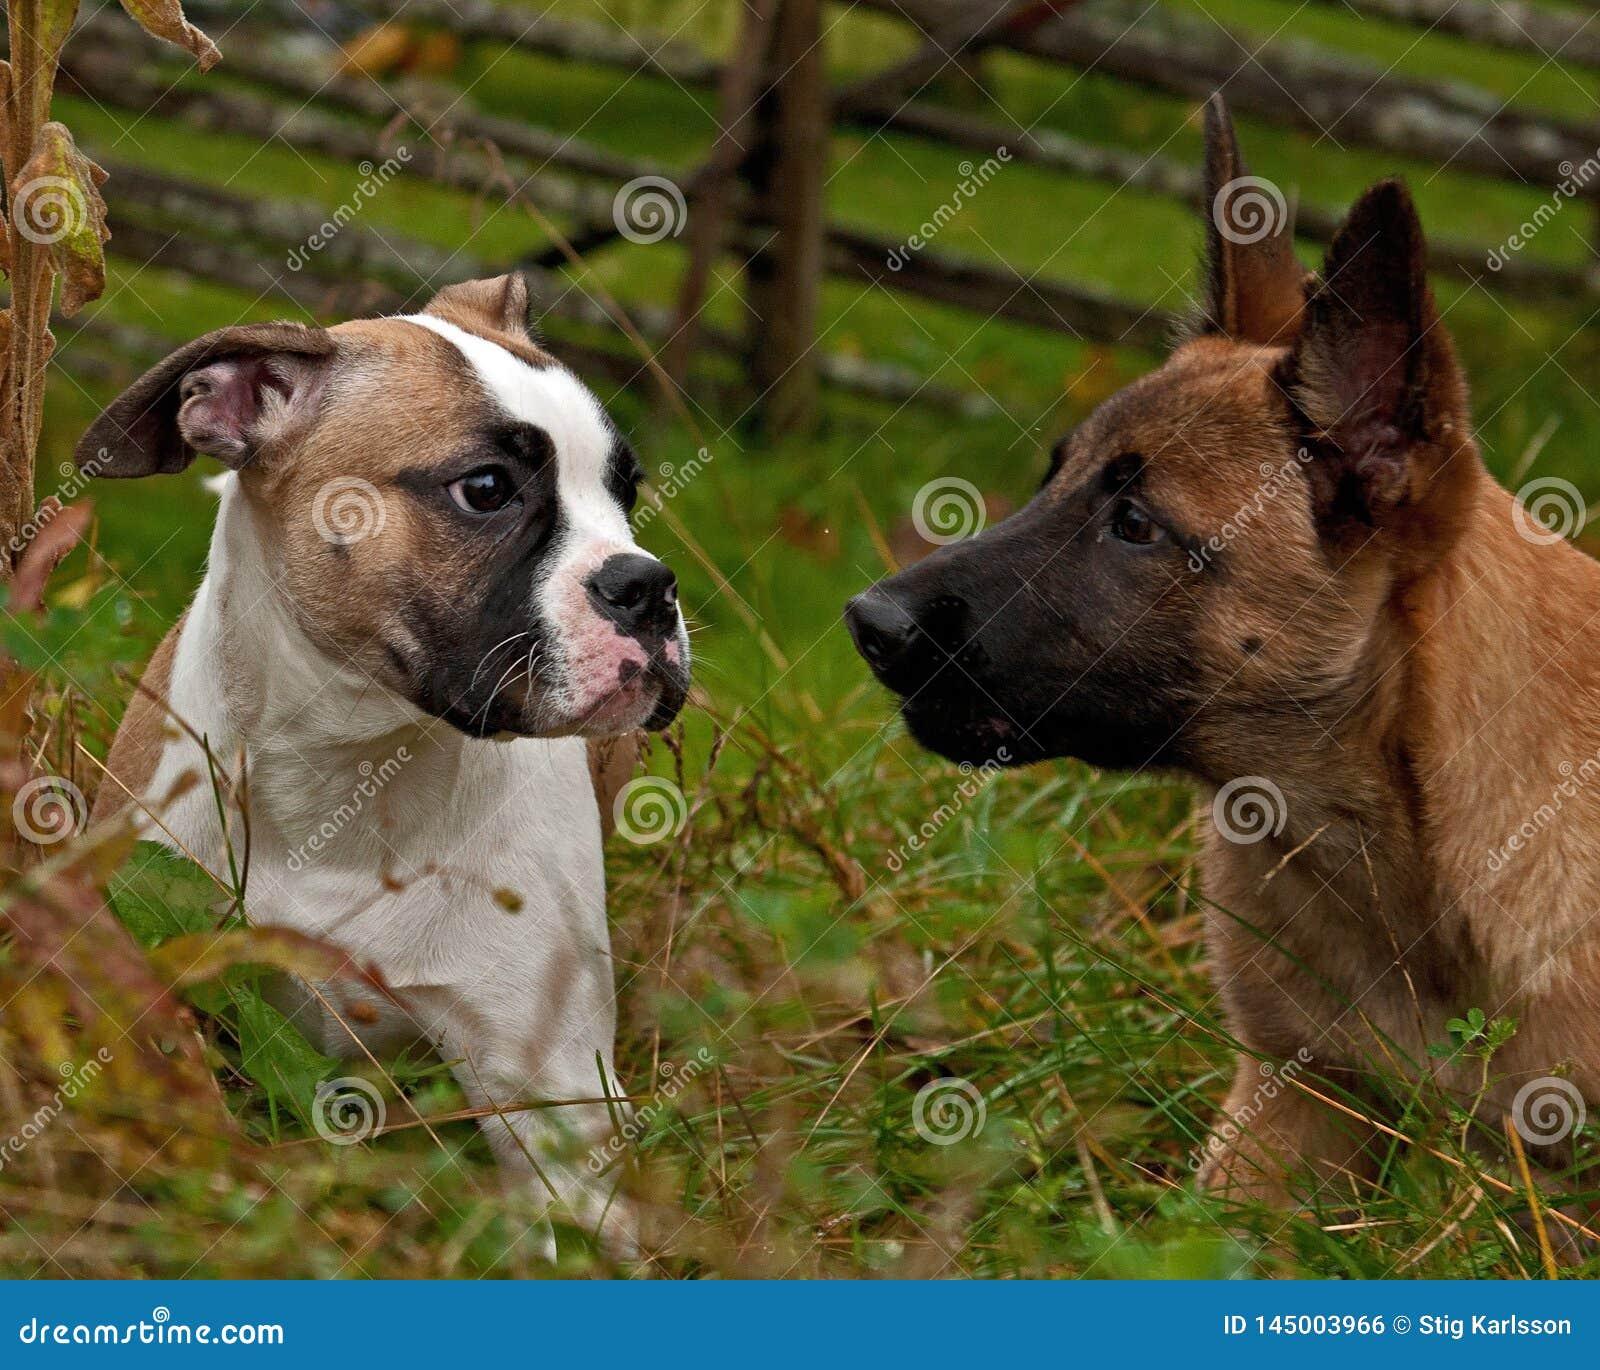 American Bulldog puppy and a Malinois puppy,